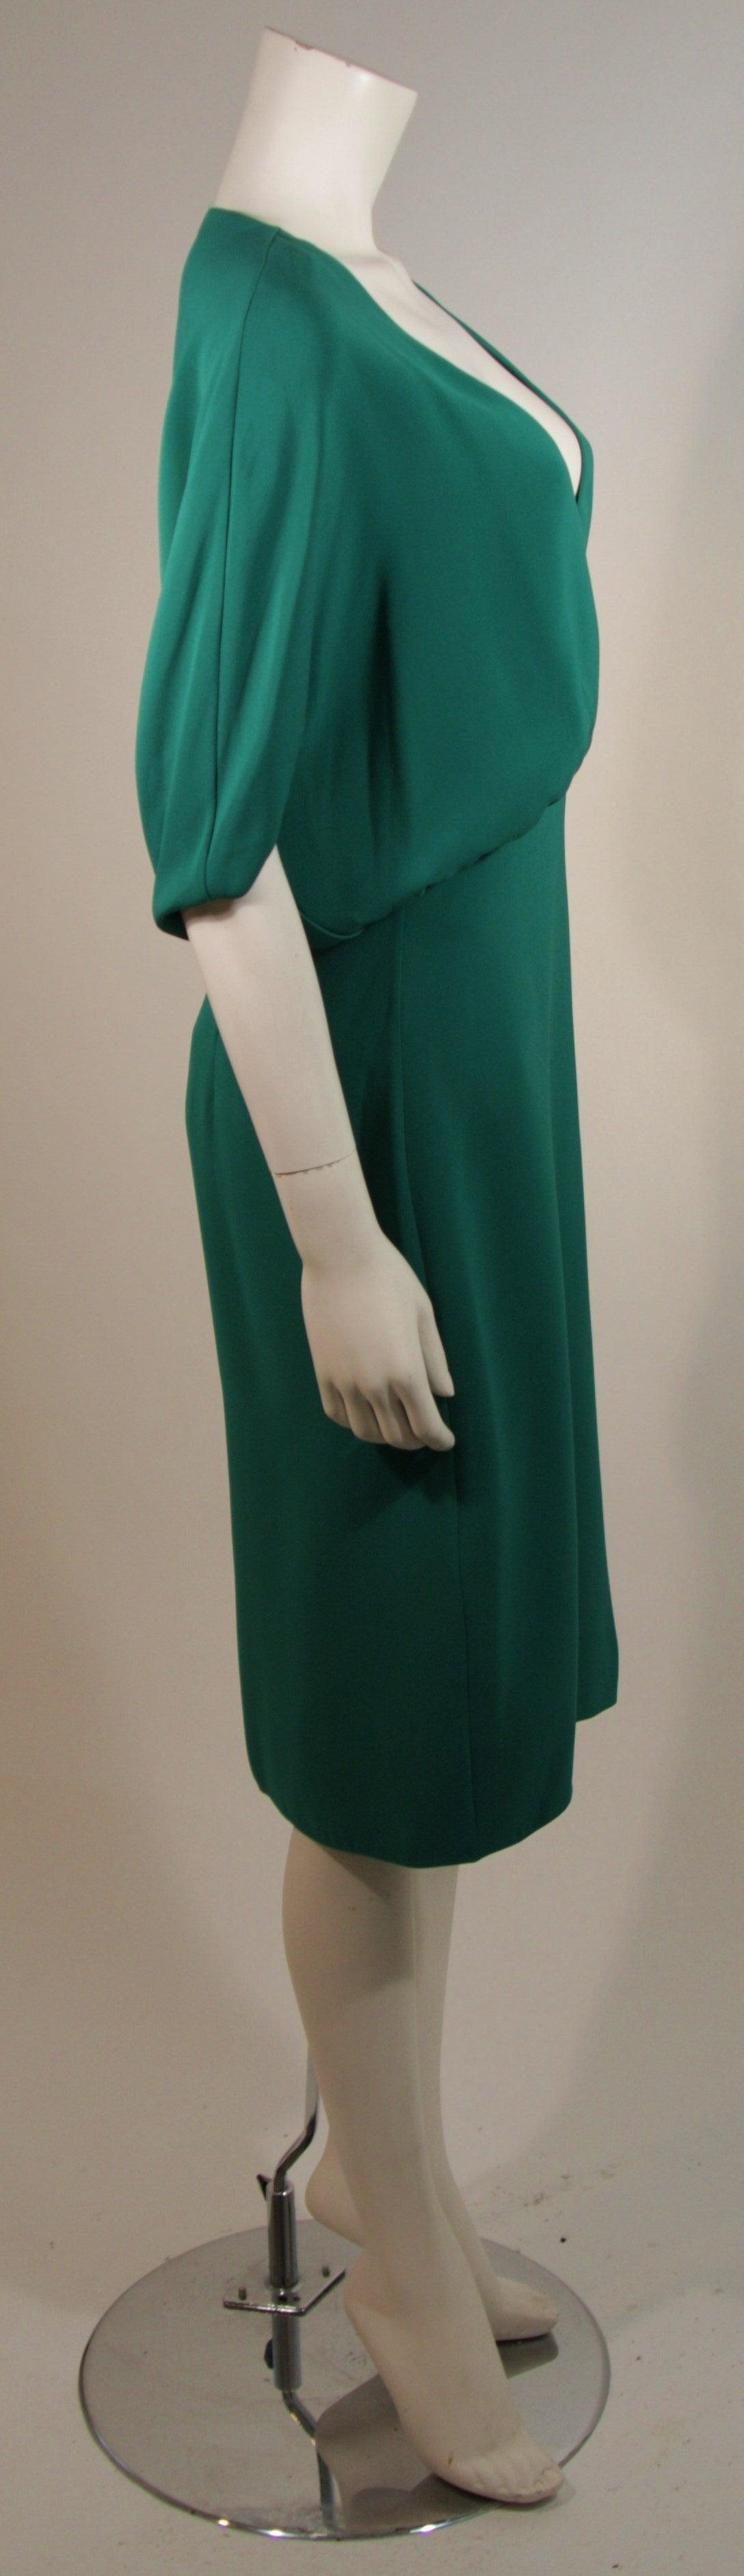 Valentino Green Silk Cocktail Dress with Plunge Neckline Size 8 For Sale 1